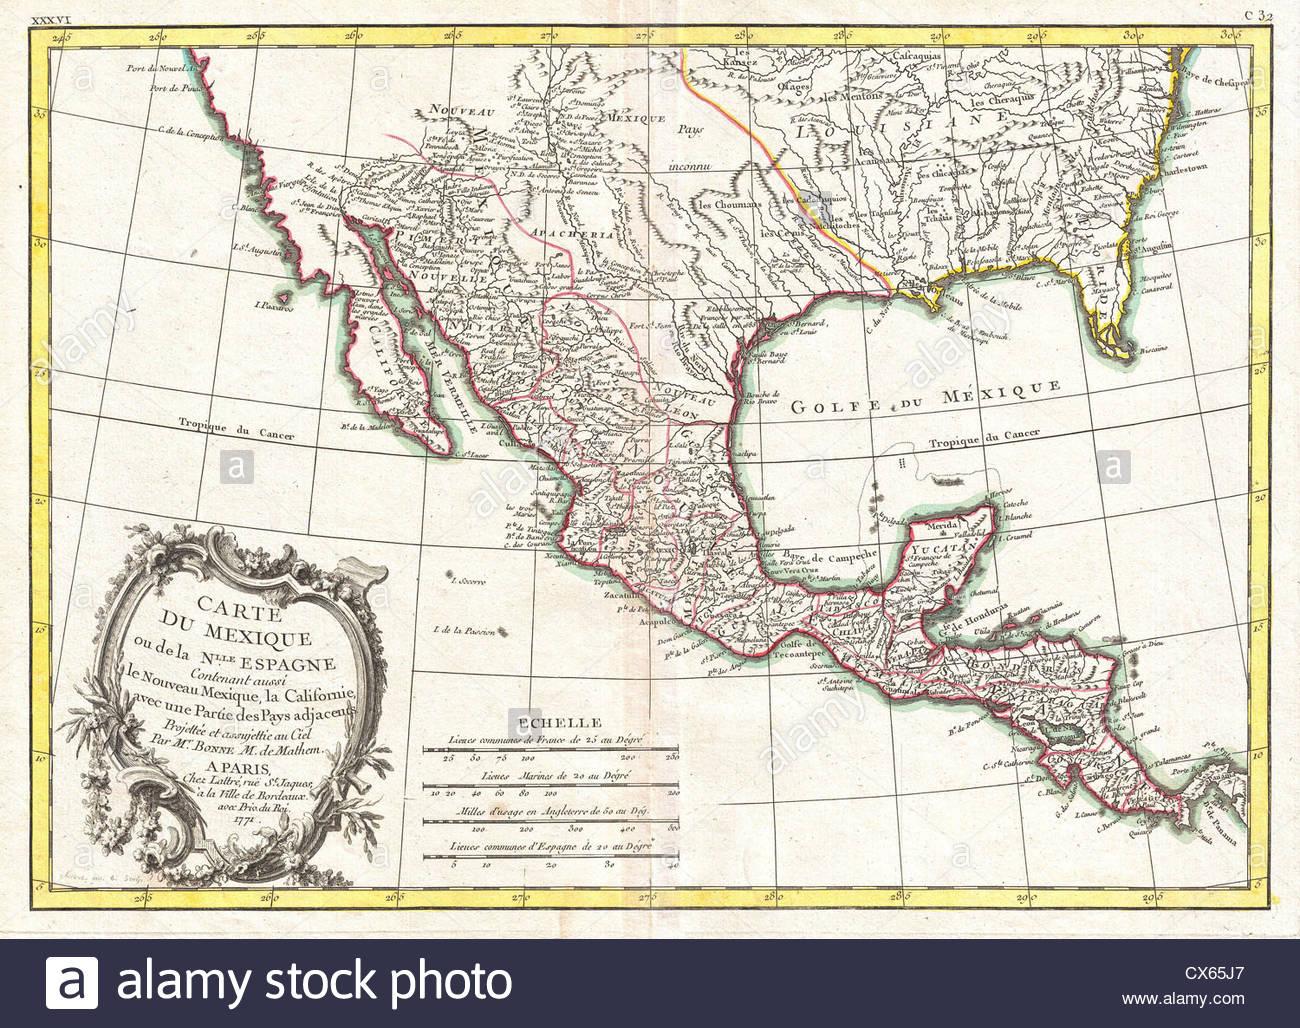 1771 Bonne Map Of Mexico (Texas), Louisiana And Florida Stock Photo - Texas Louisiana Border Map